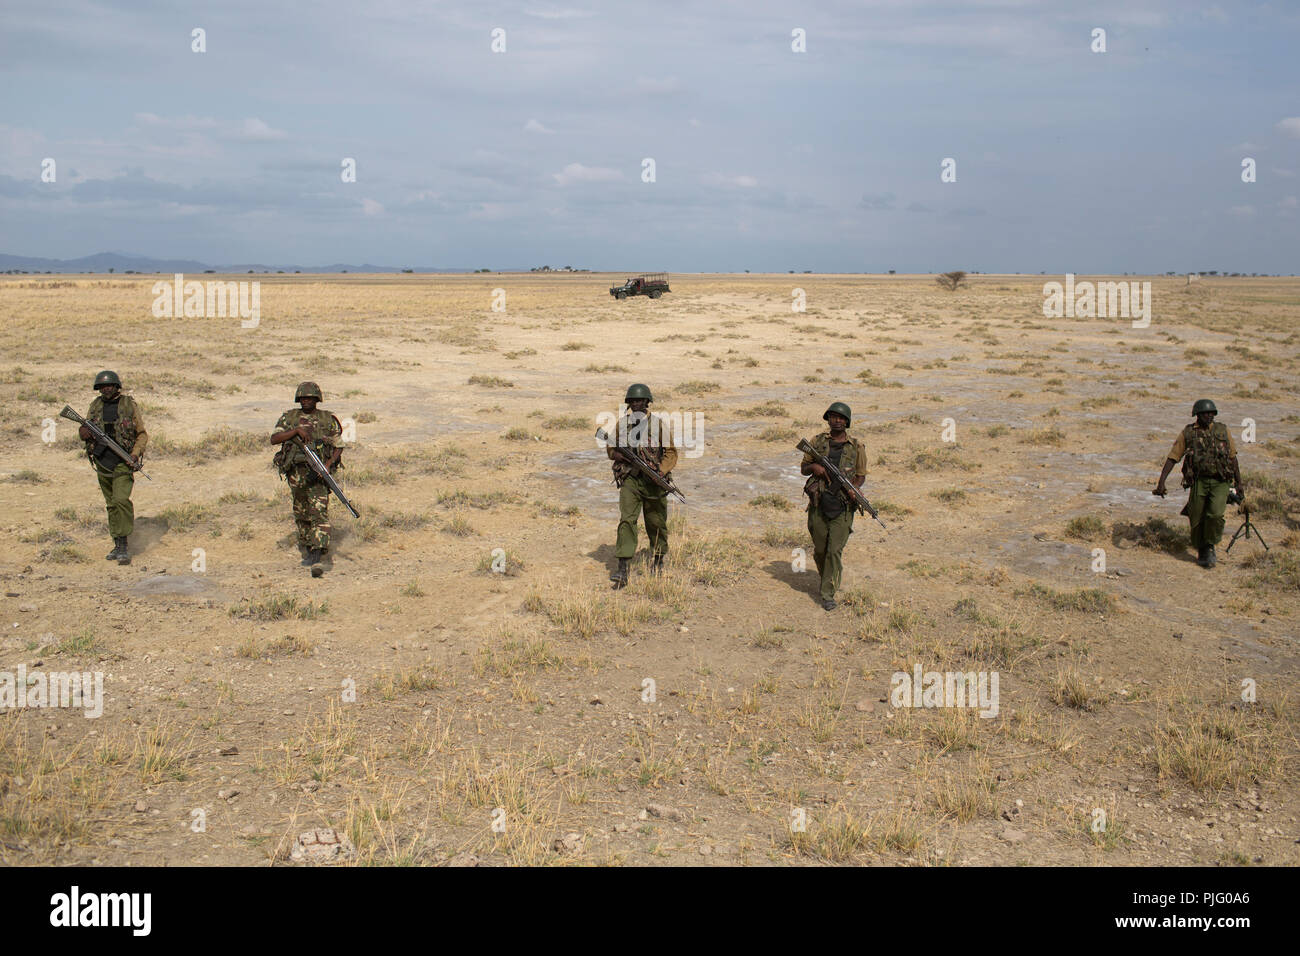 Kenyan soldiers patrol a region in Turkana, northern Kenya, November 5, 2012 Stock Photo